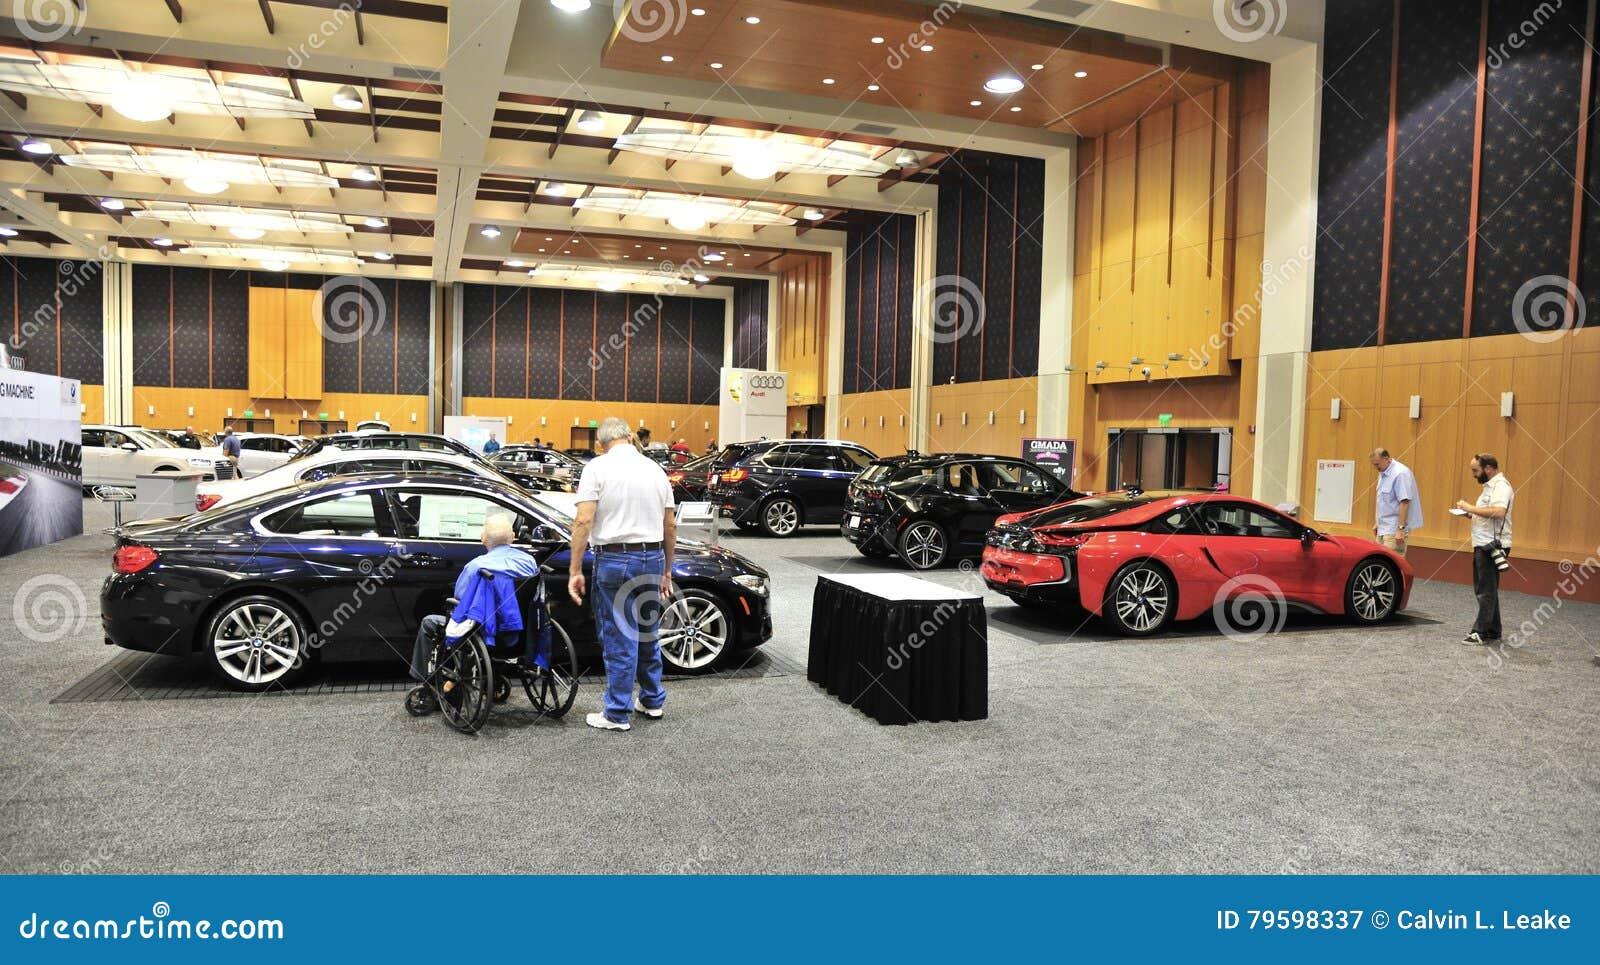 Memphis International Auto Show Editorial Photography Image Of - Memphis car show